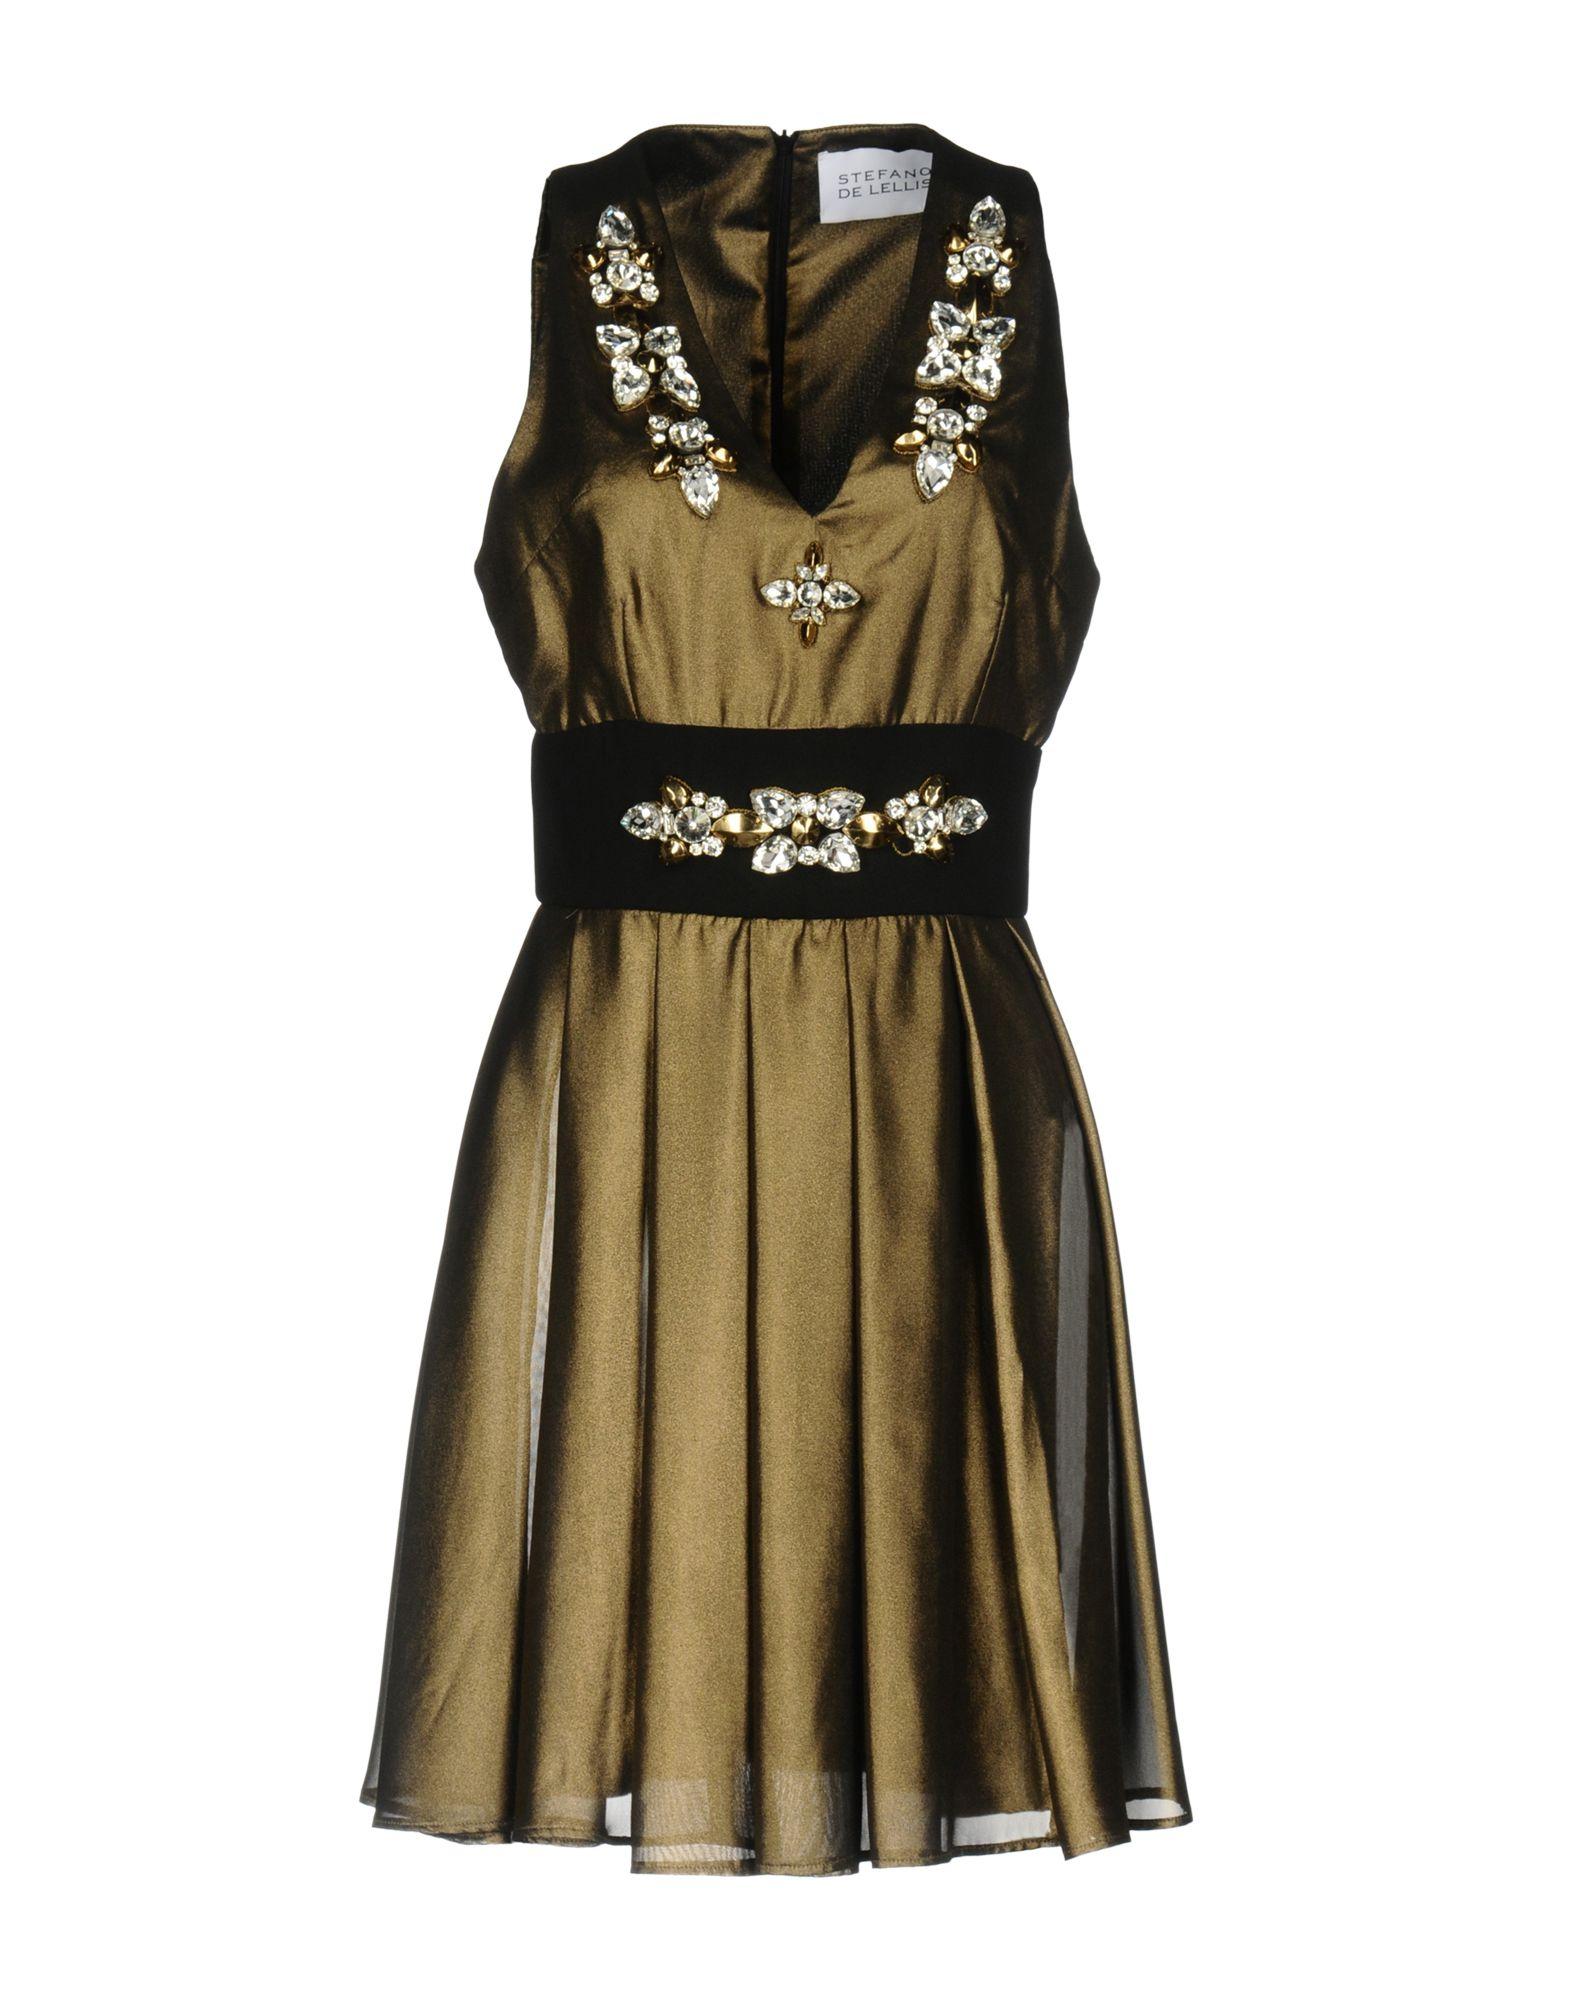 STEFANO DE LELLIS Short Dresses in Bronze